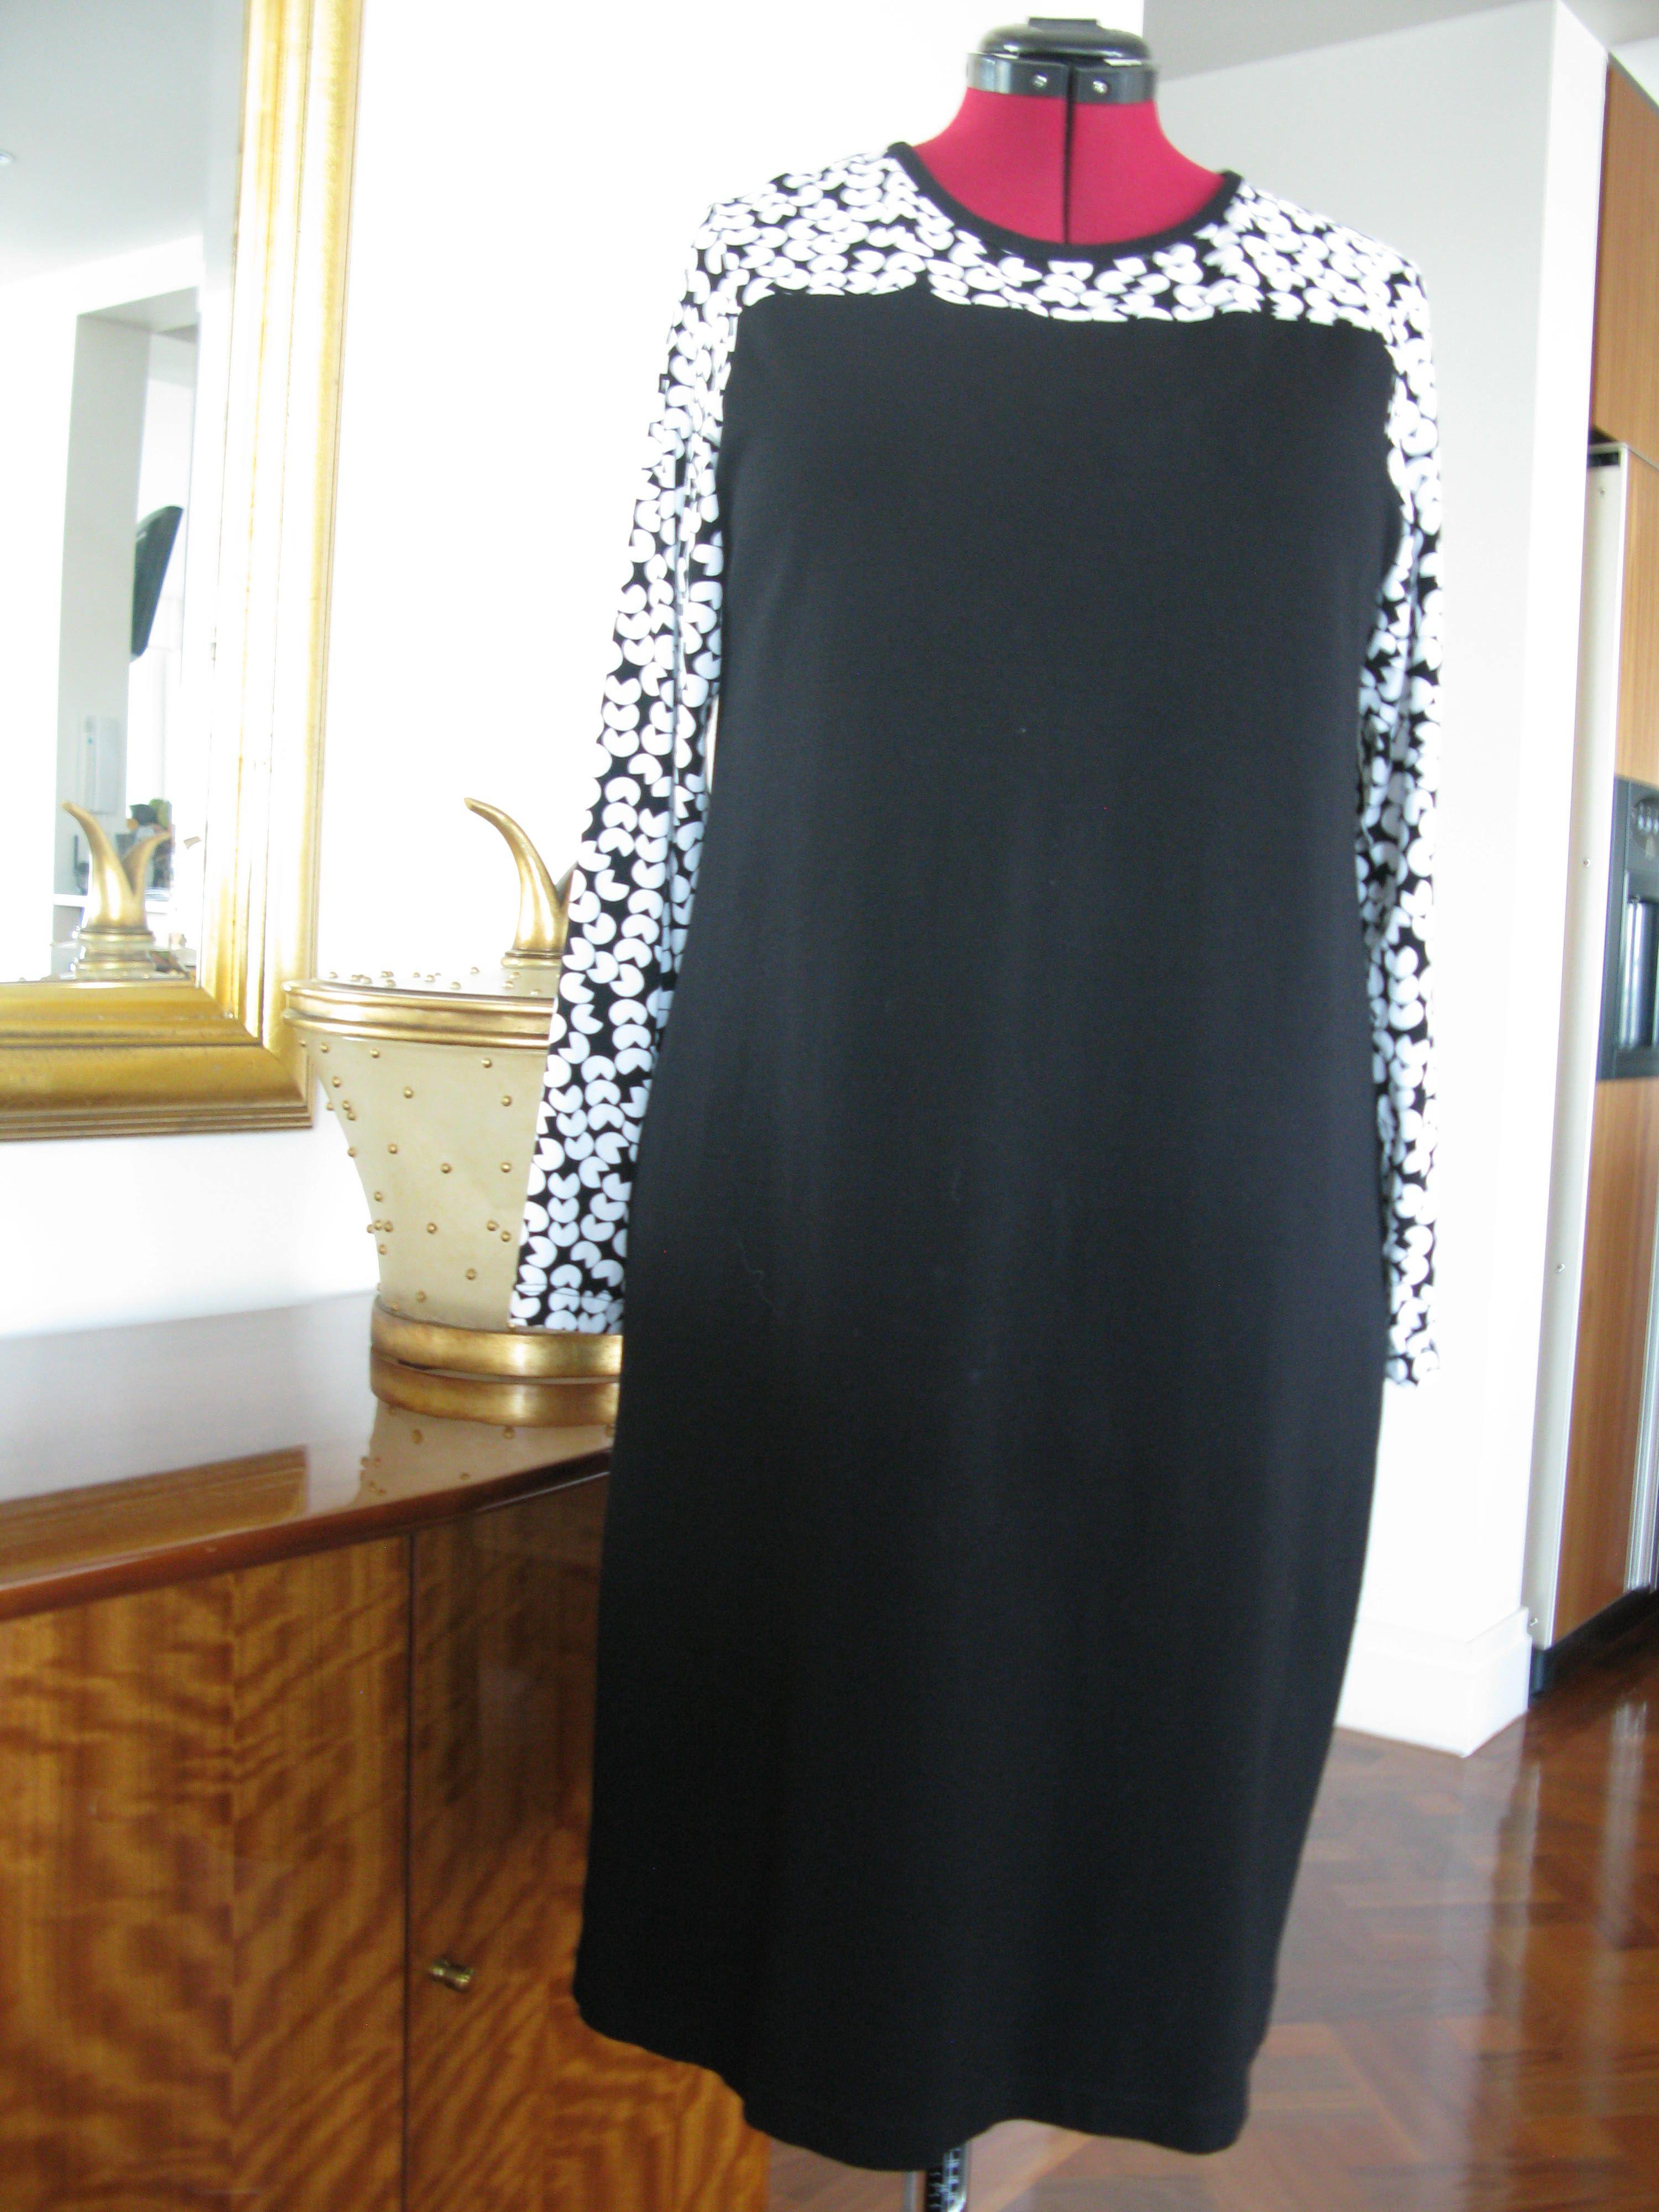 StleArc Laura dress in Tessuti knit fabrics